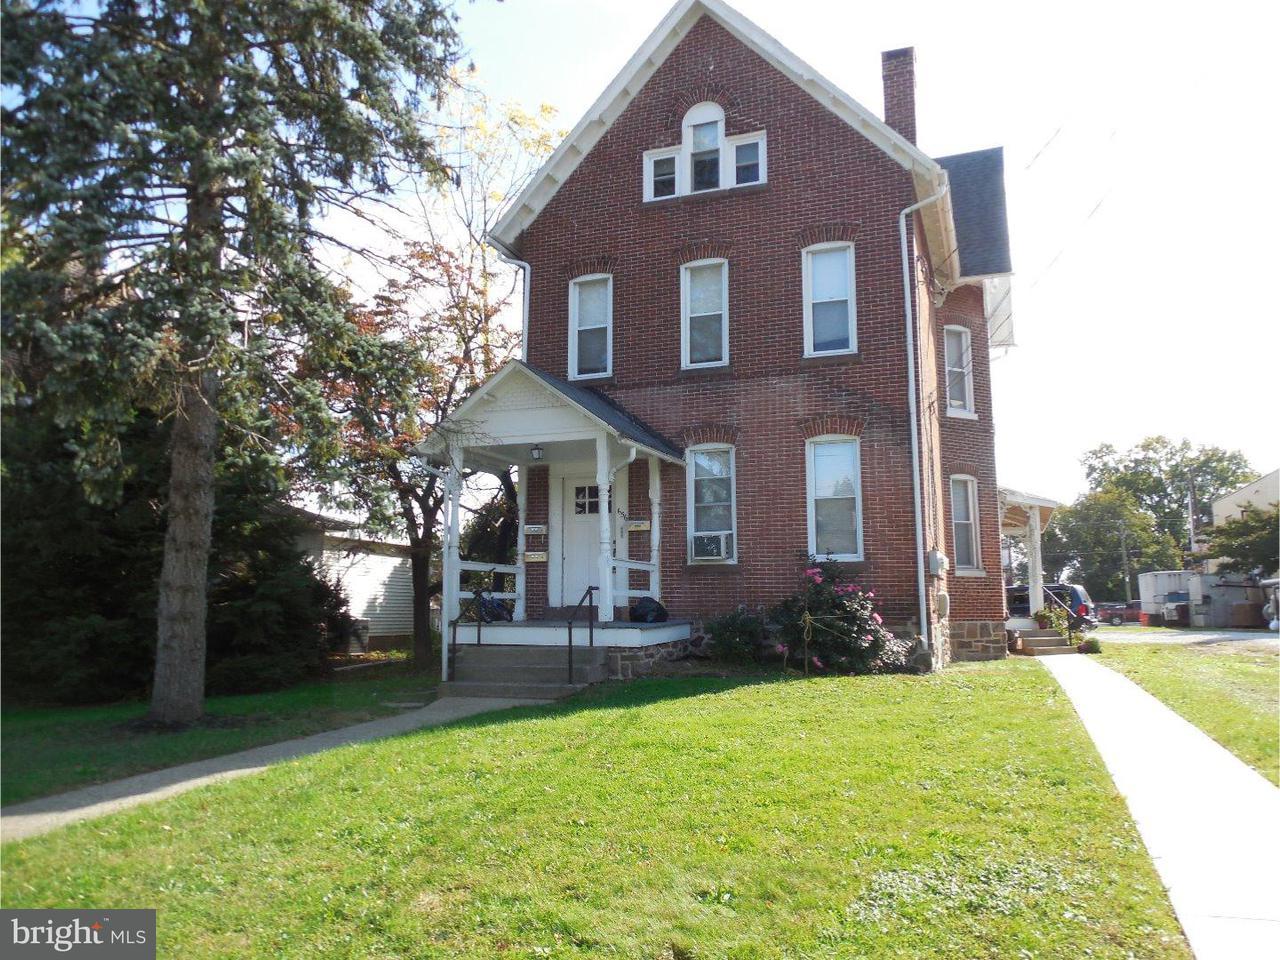 Triplex for Rent at 656 MAIN Street Royersford, Pennsylvania 19468 United States